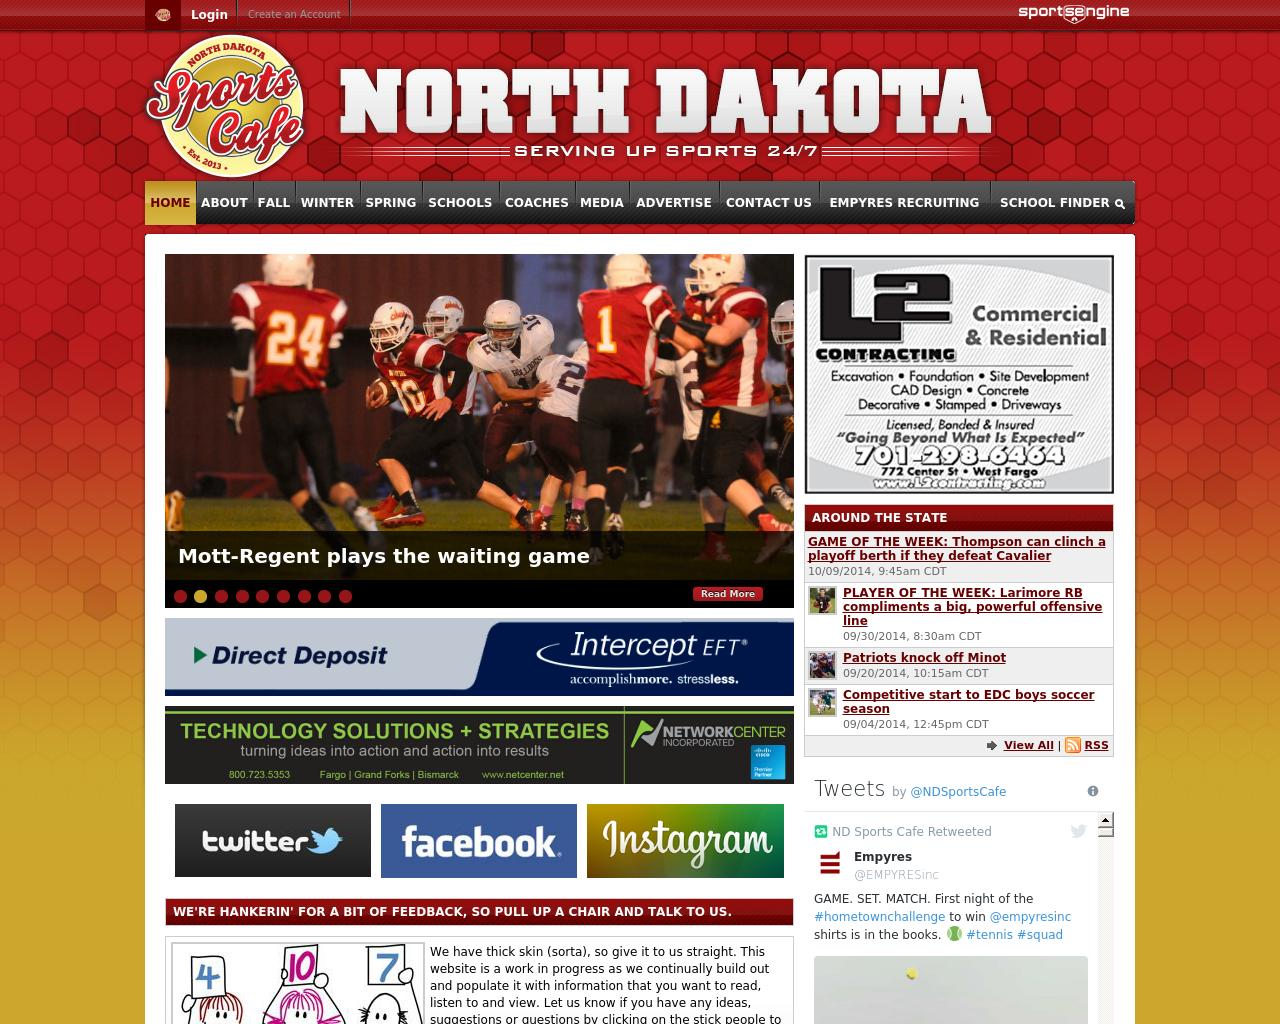 North-Dakota-Sports-Cafe-Advertising-Reviews-Pricing